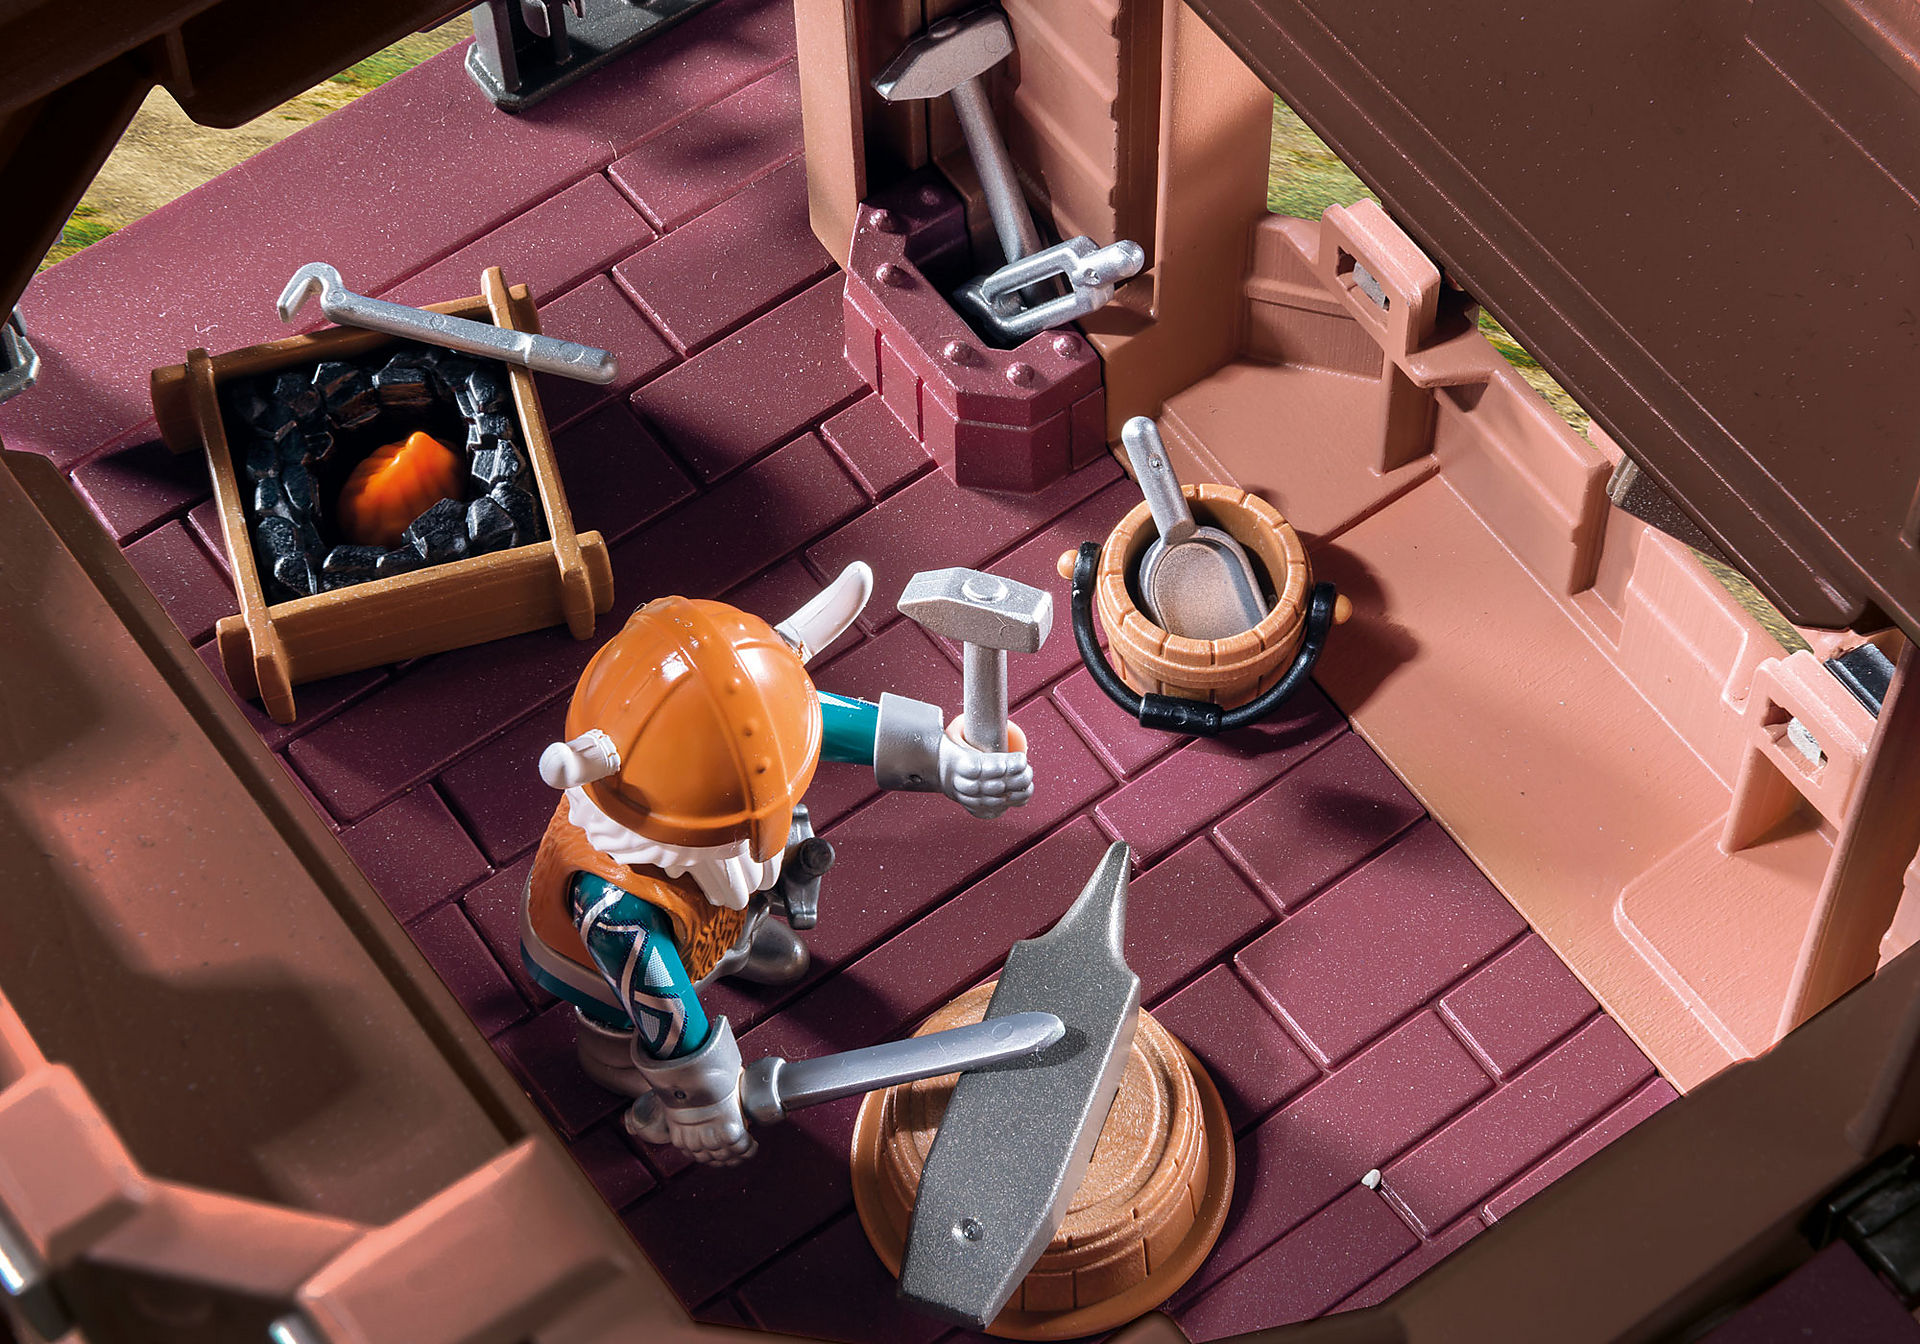 9340 Mobilna forteca krasnoludów zoom image9